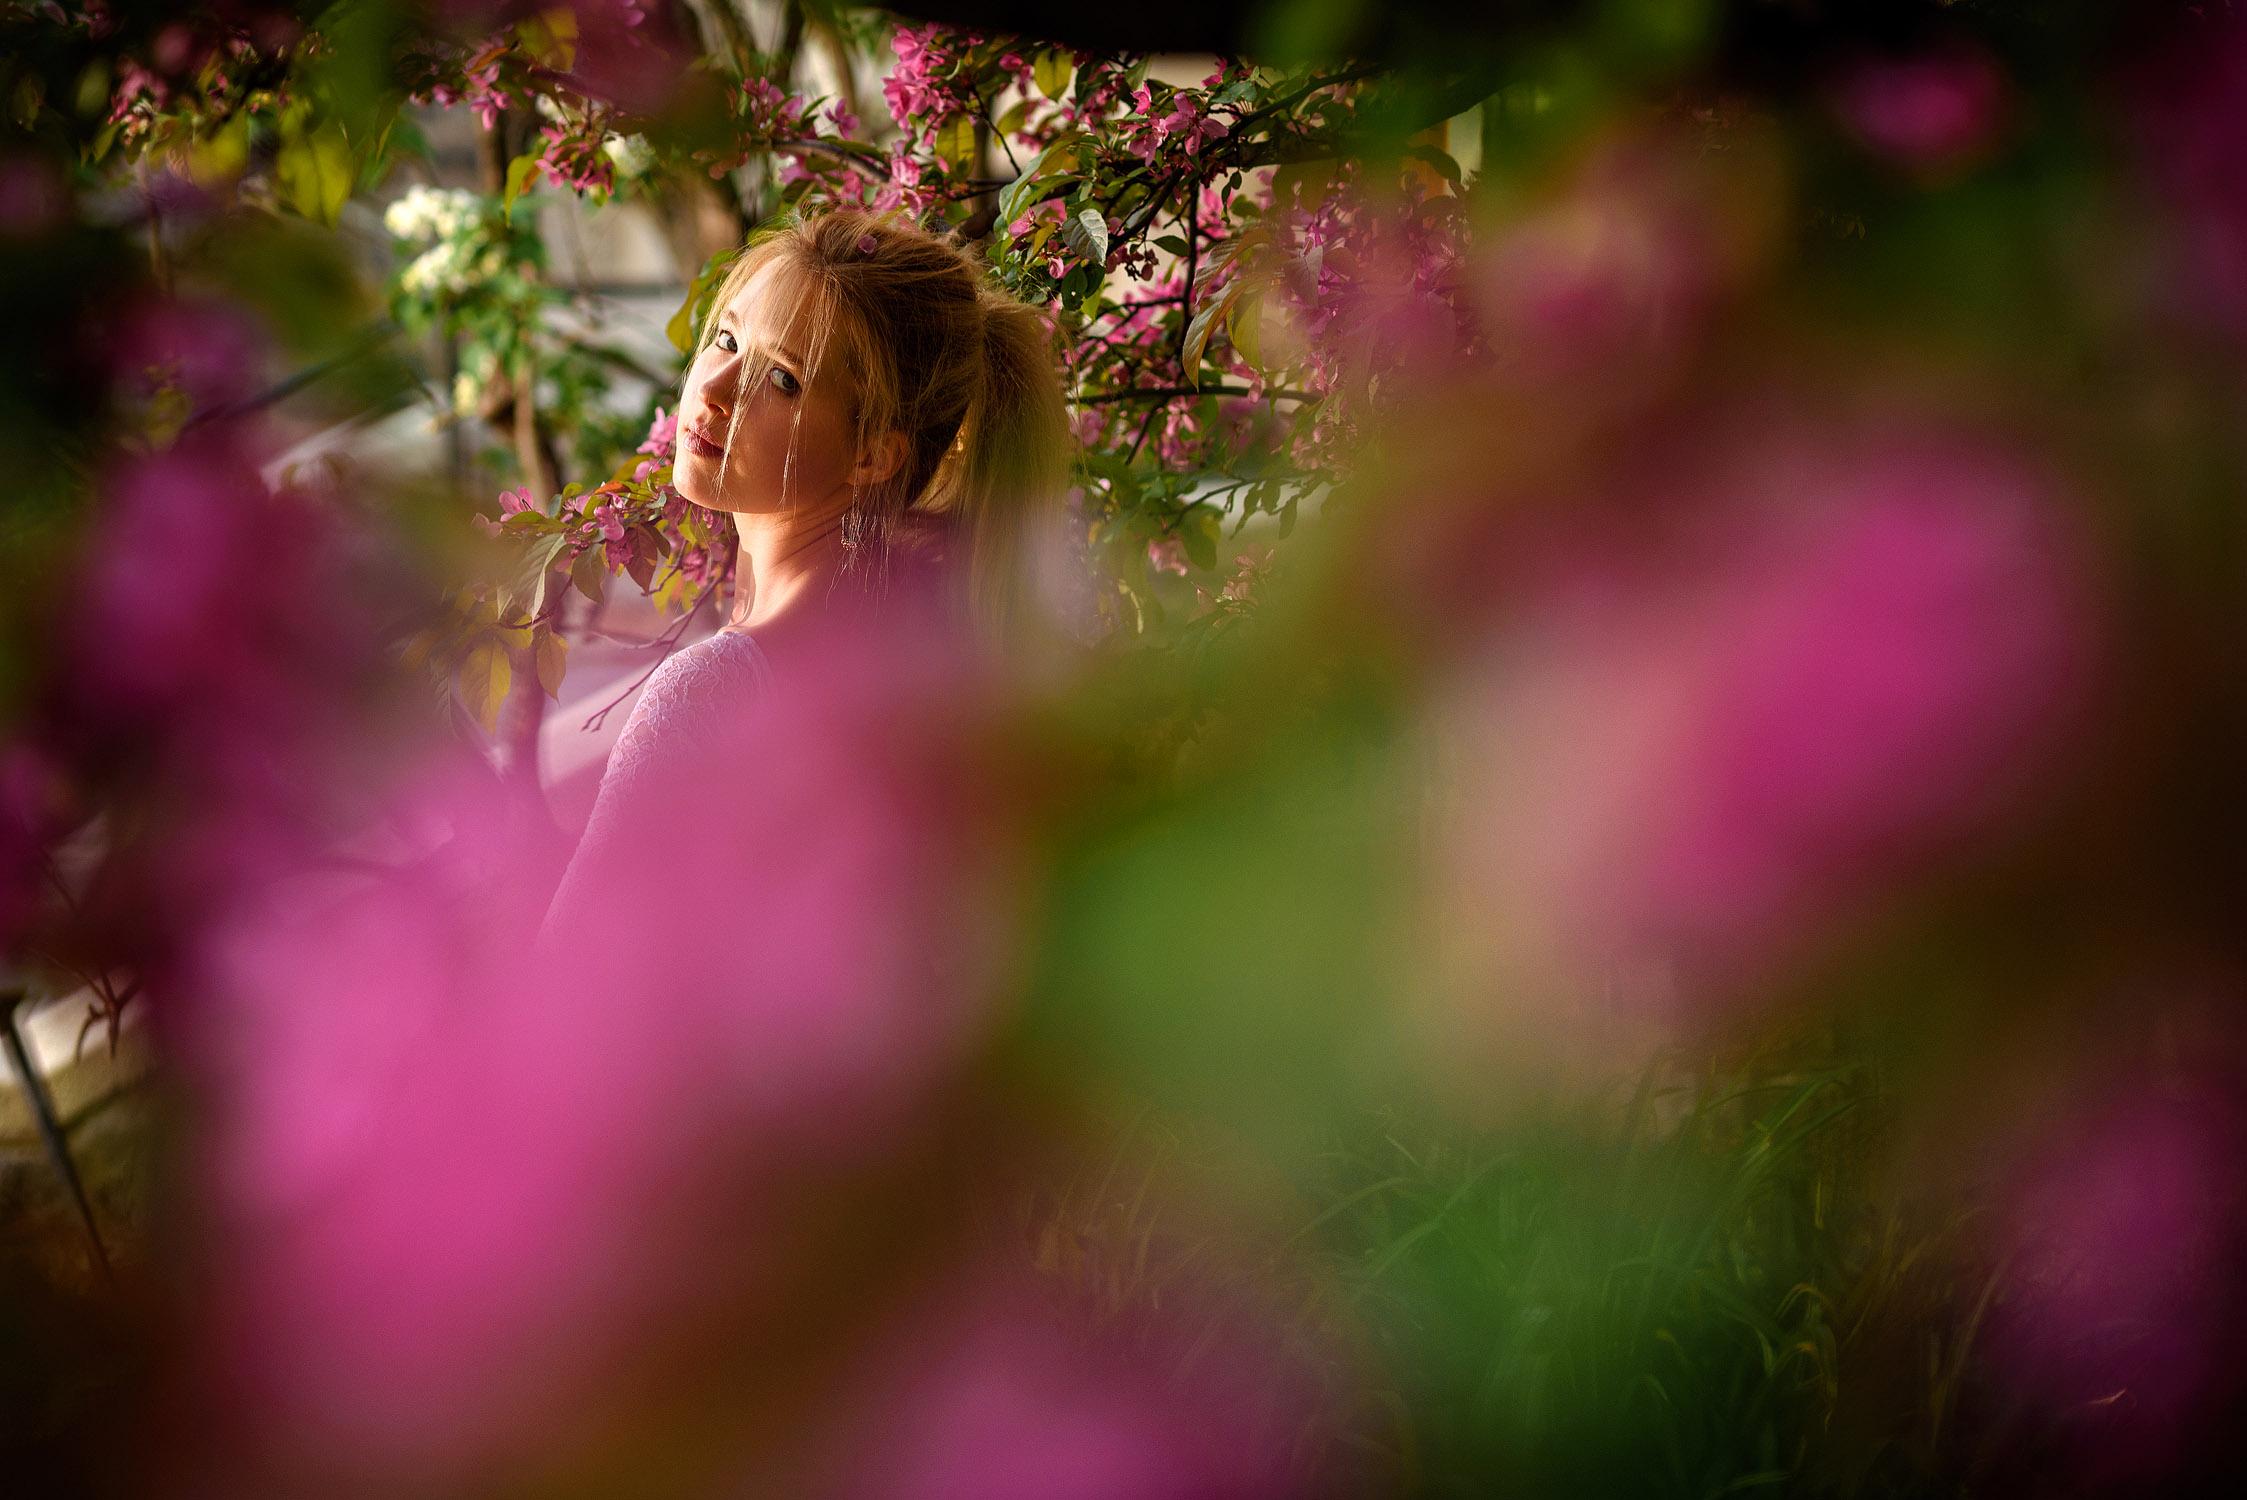 marianne-flowers-201706-publish-order-14.jpg